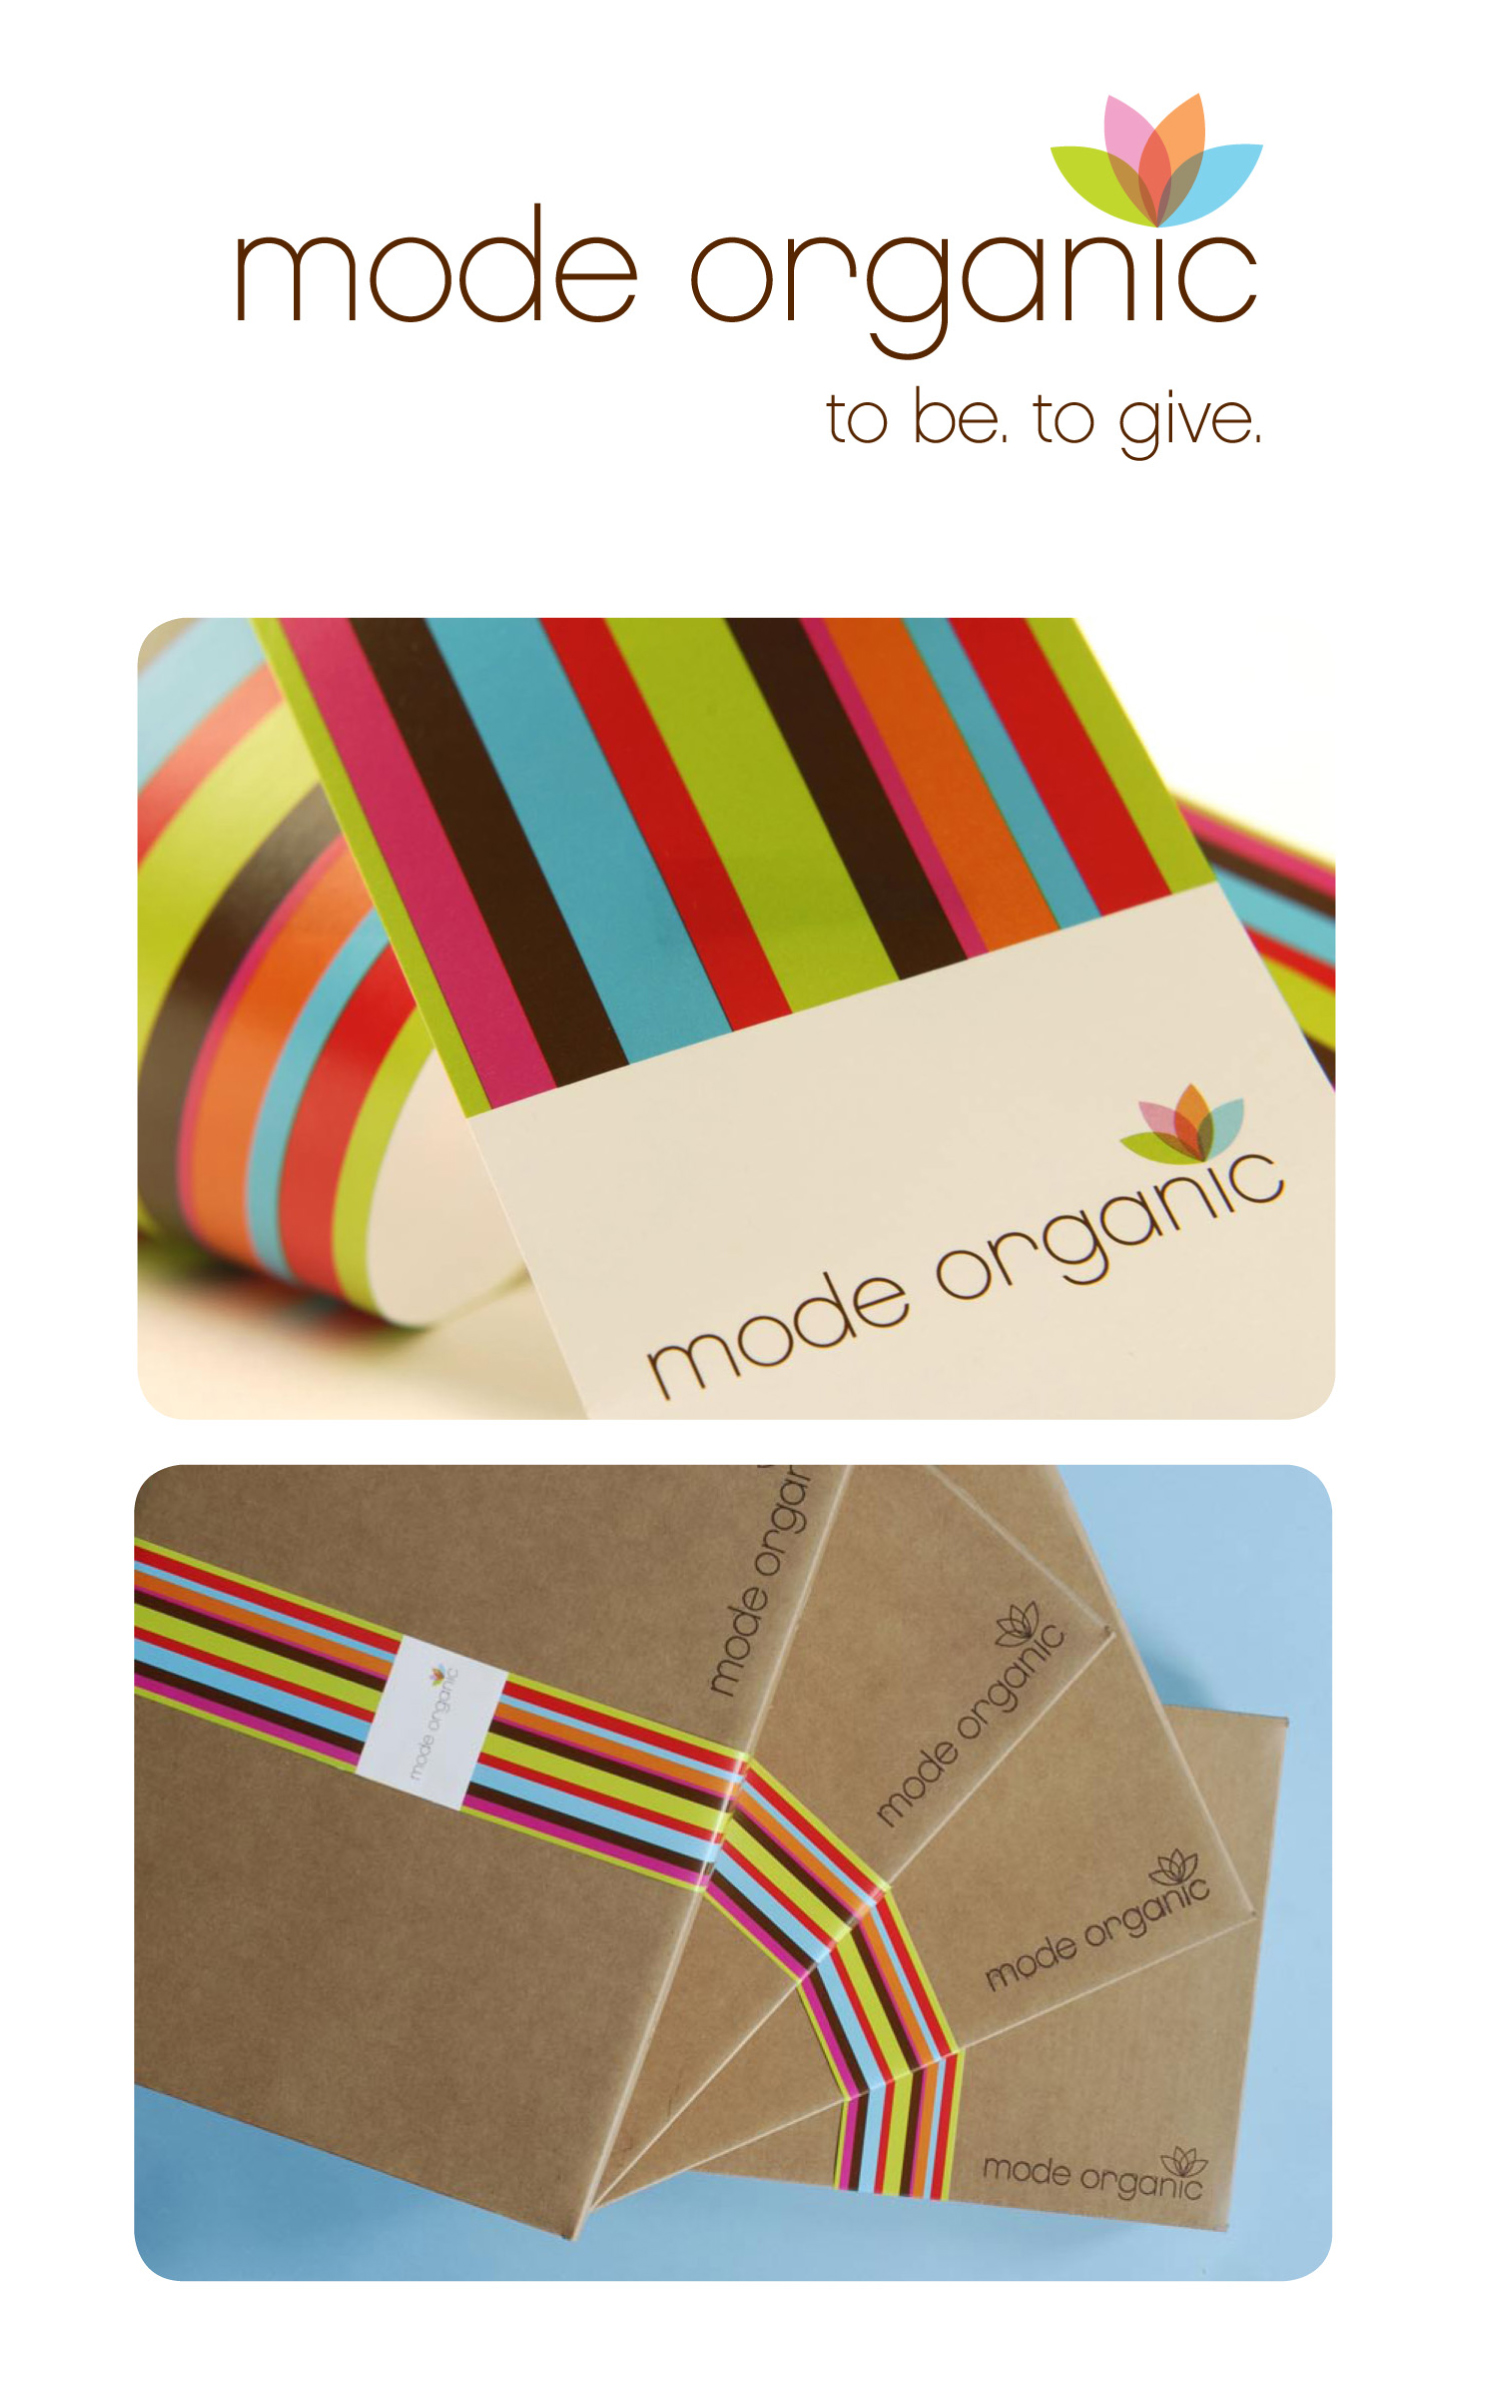 modeorganic.jpg